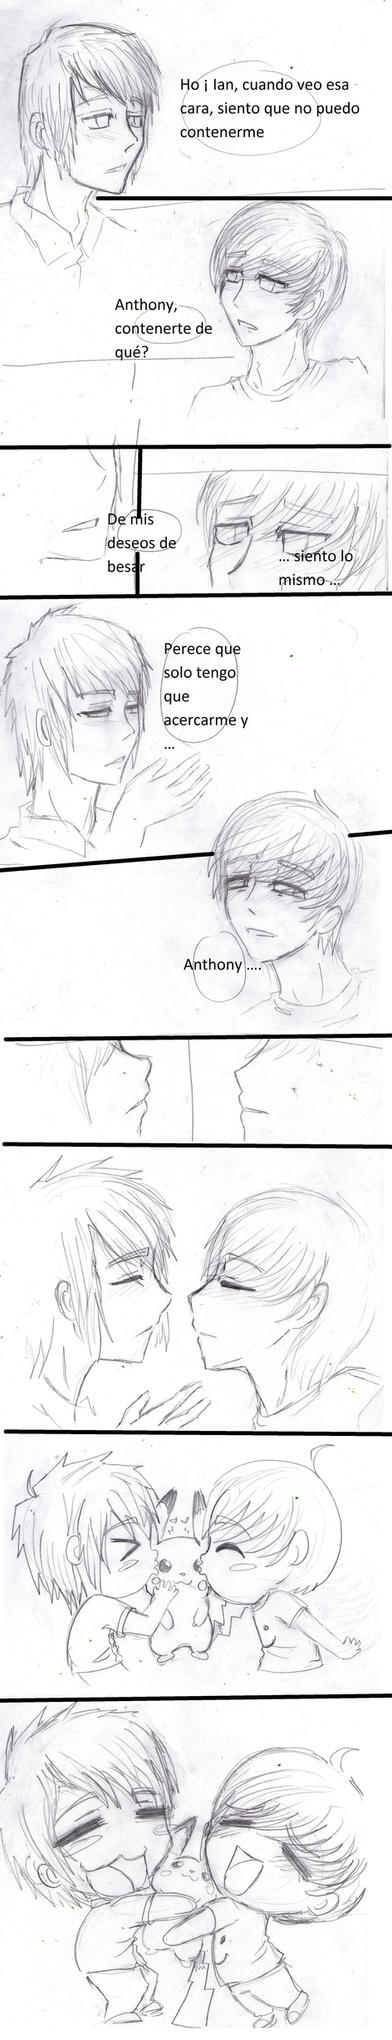 Smosh Ian and Anthony yaoi by ClaudiaVianney